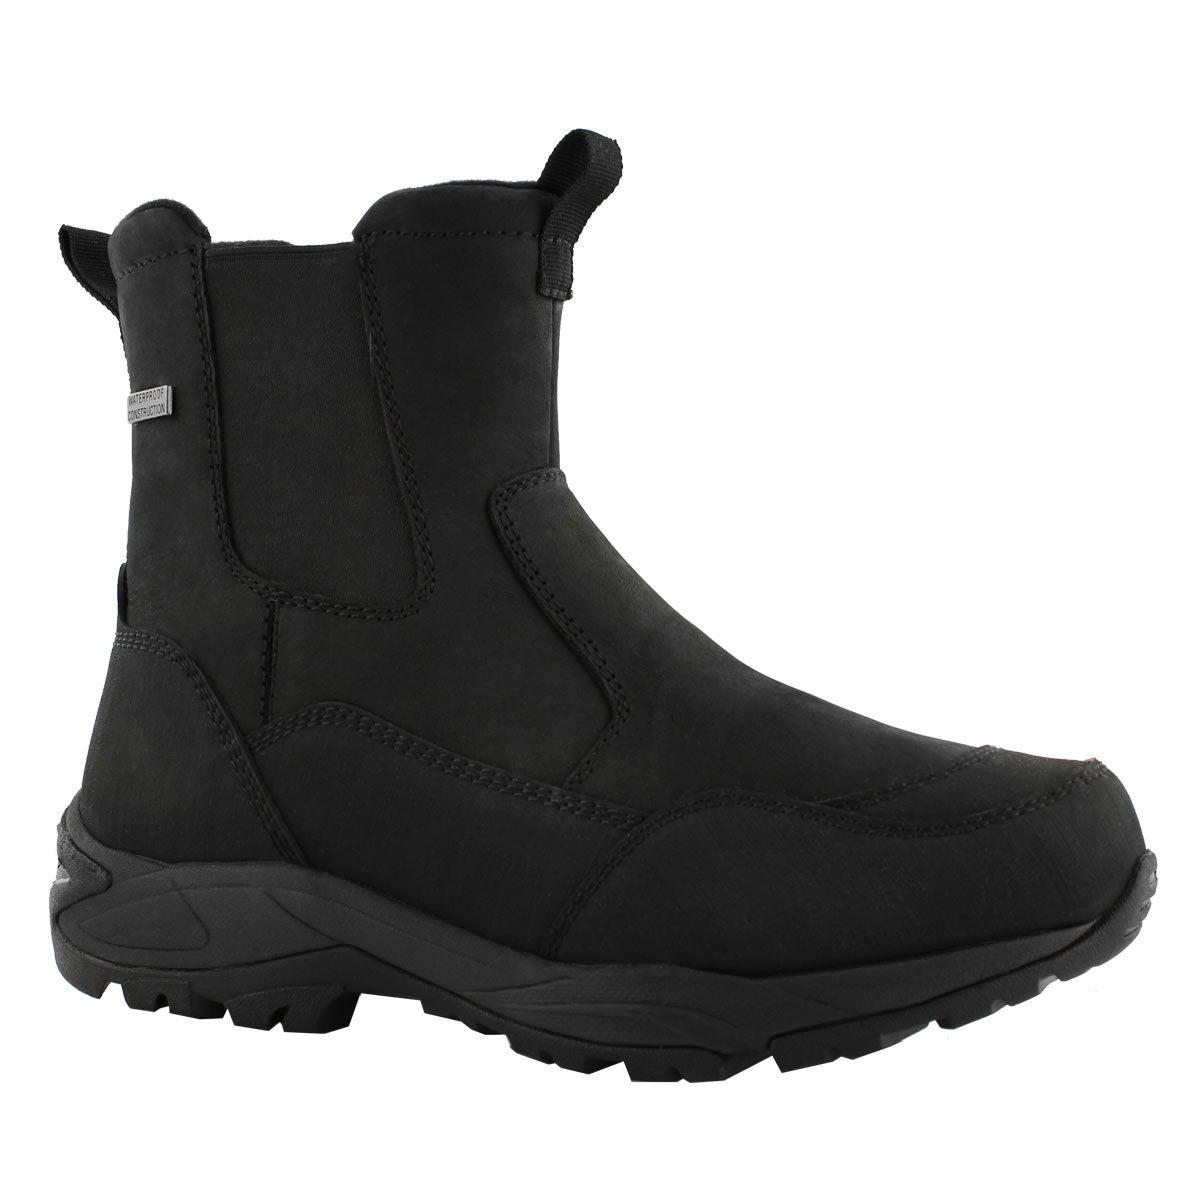 Mns Mason 2 black wtpf winter boot